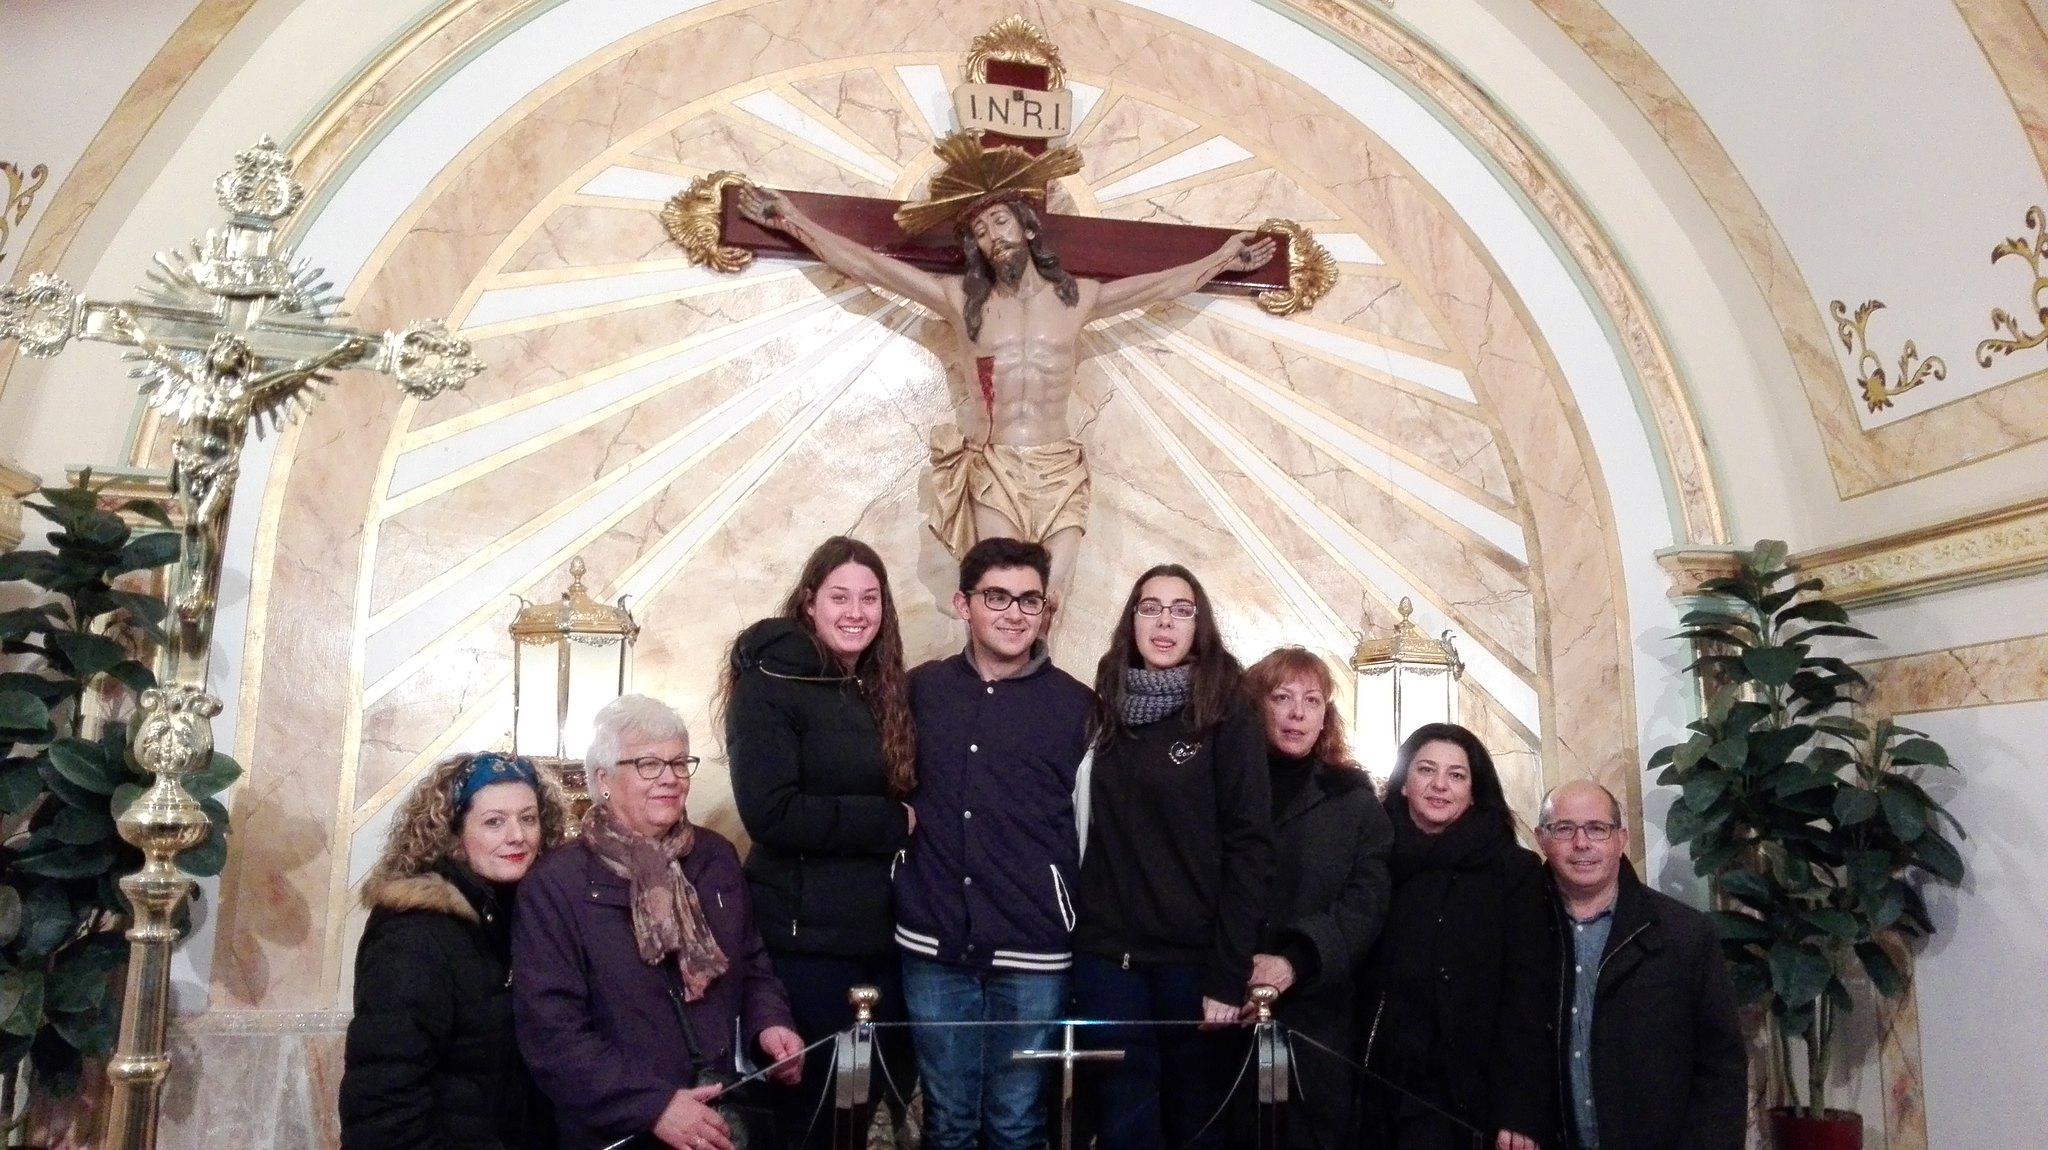 (2016-03-18) - VII Vía Crucis nocturno - Javier Romero Ripoll (131)